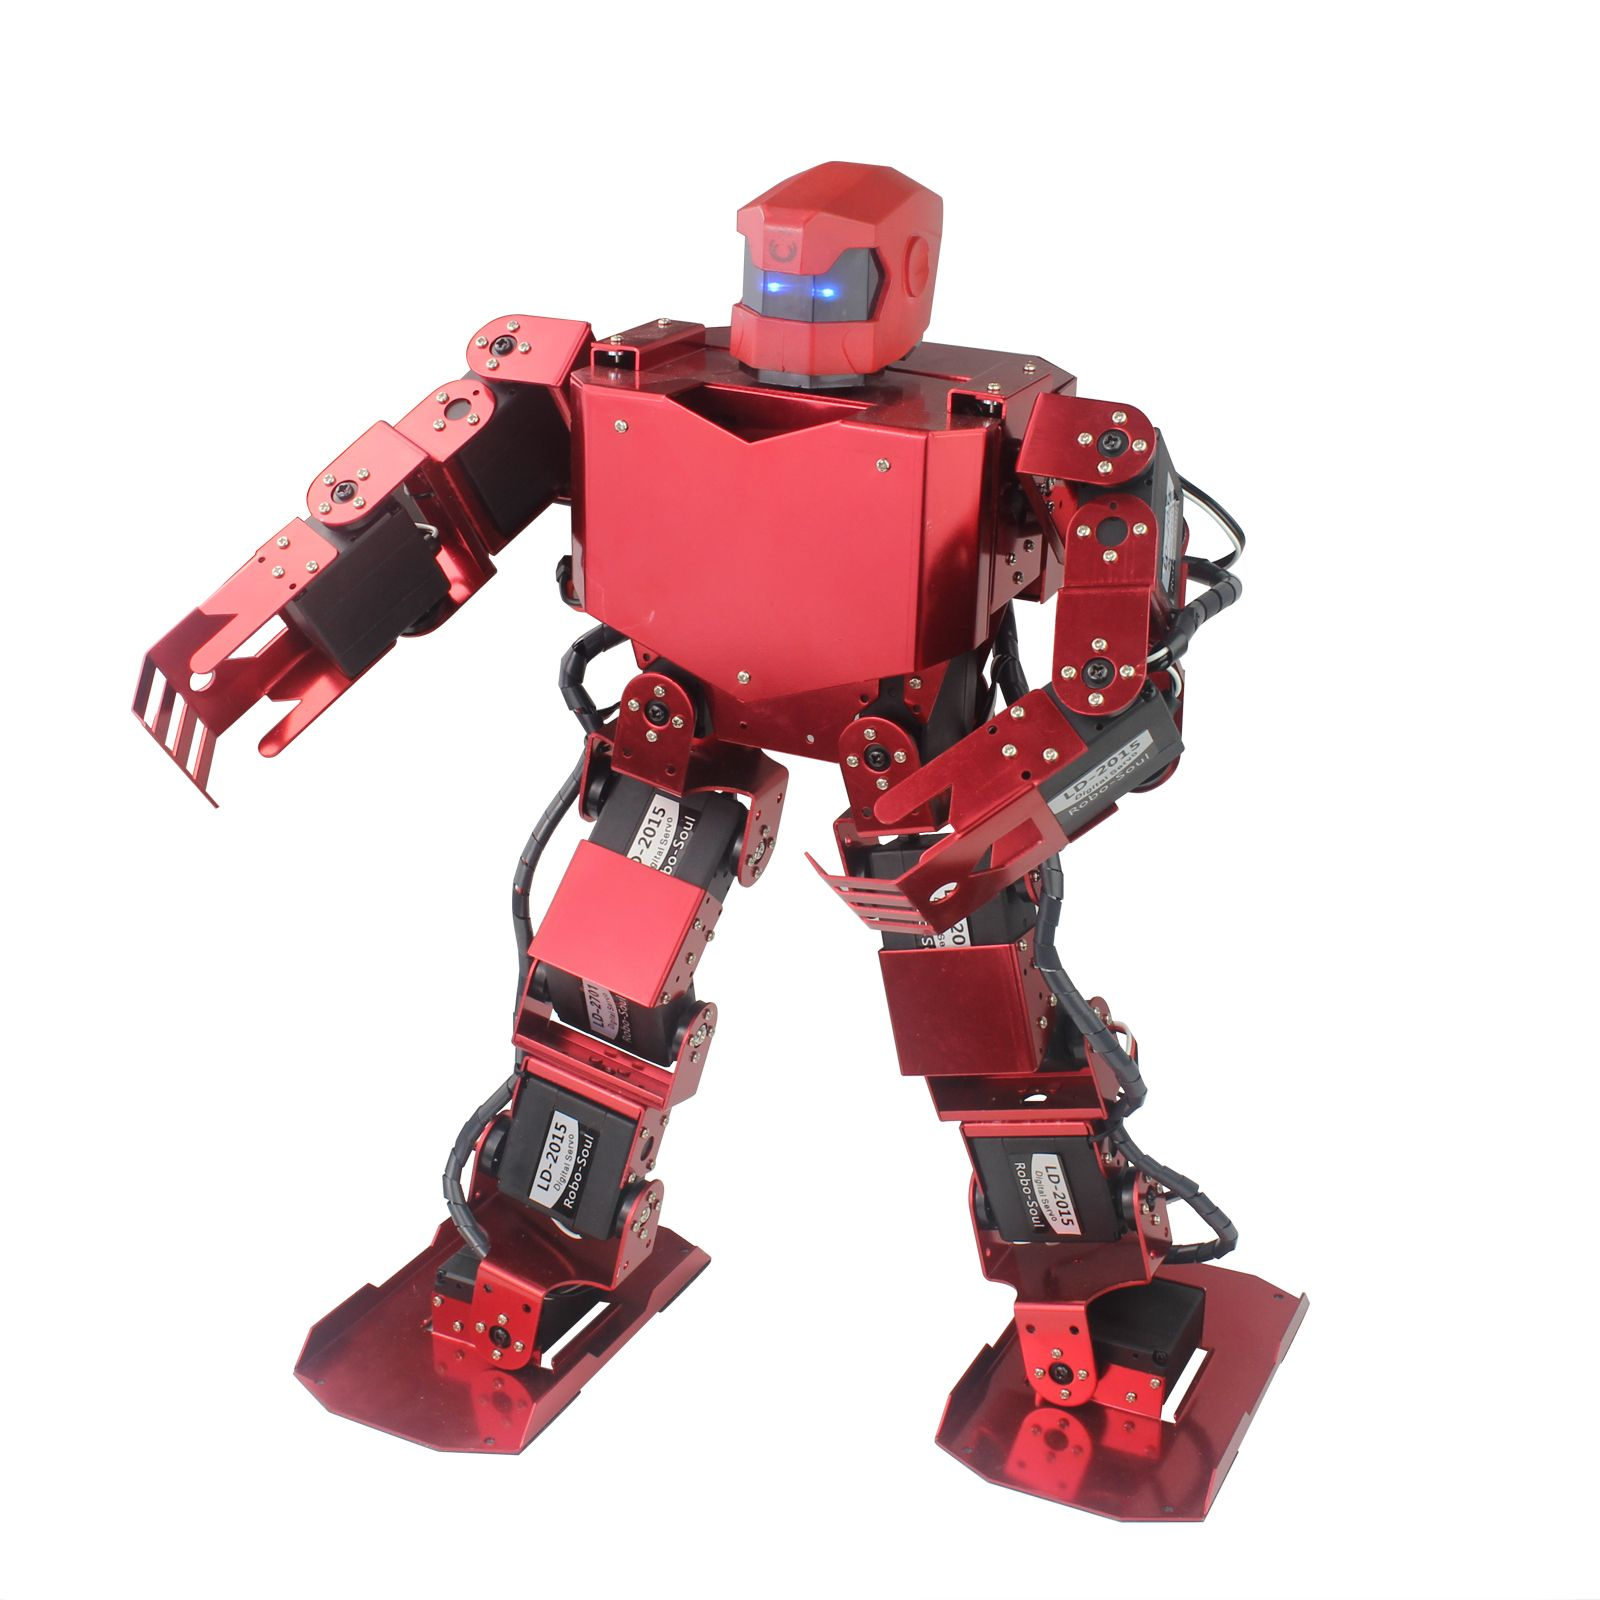 16DOF Robo-Soul H3s Biped Robotics Two Leg Human Robot Aluminum Frame Kit with Servos & Helmet Unassembled olly white or red